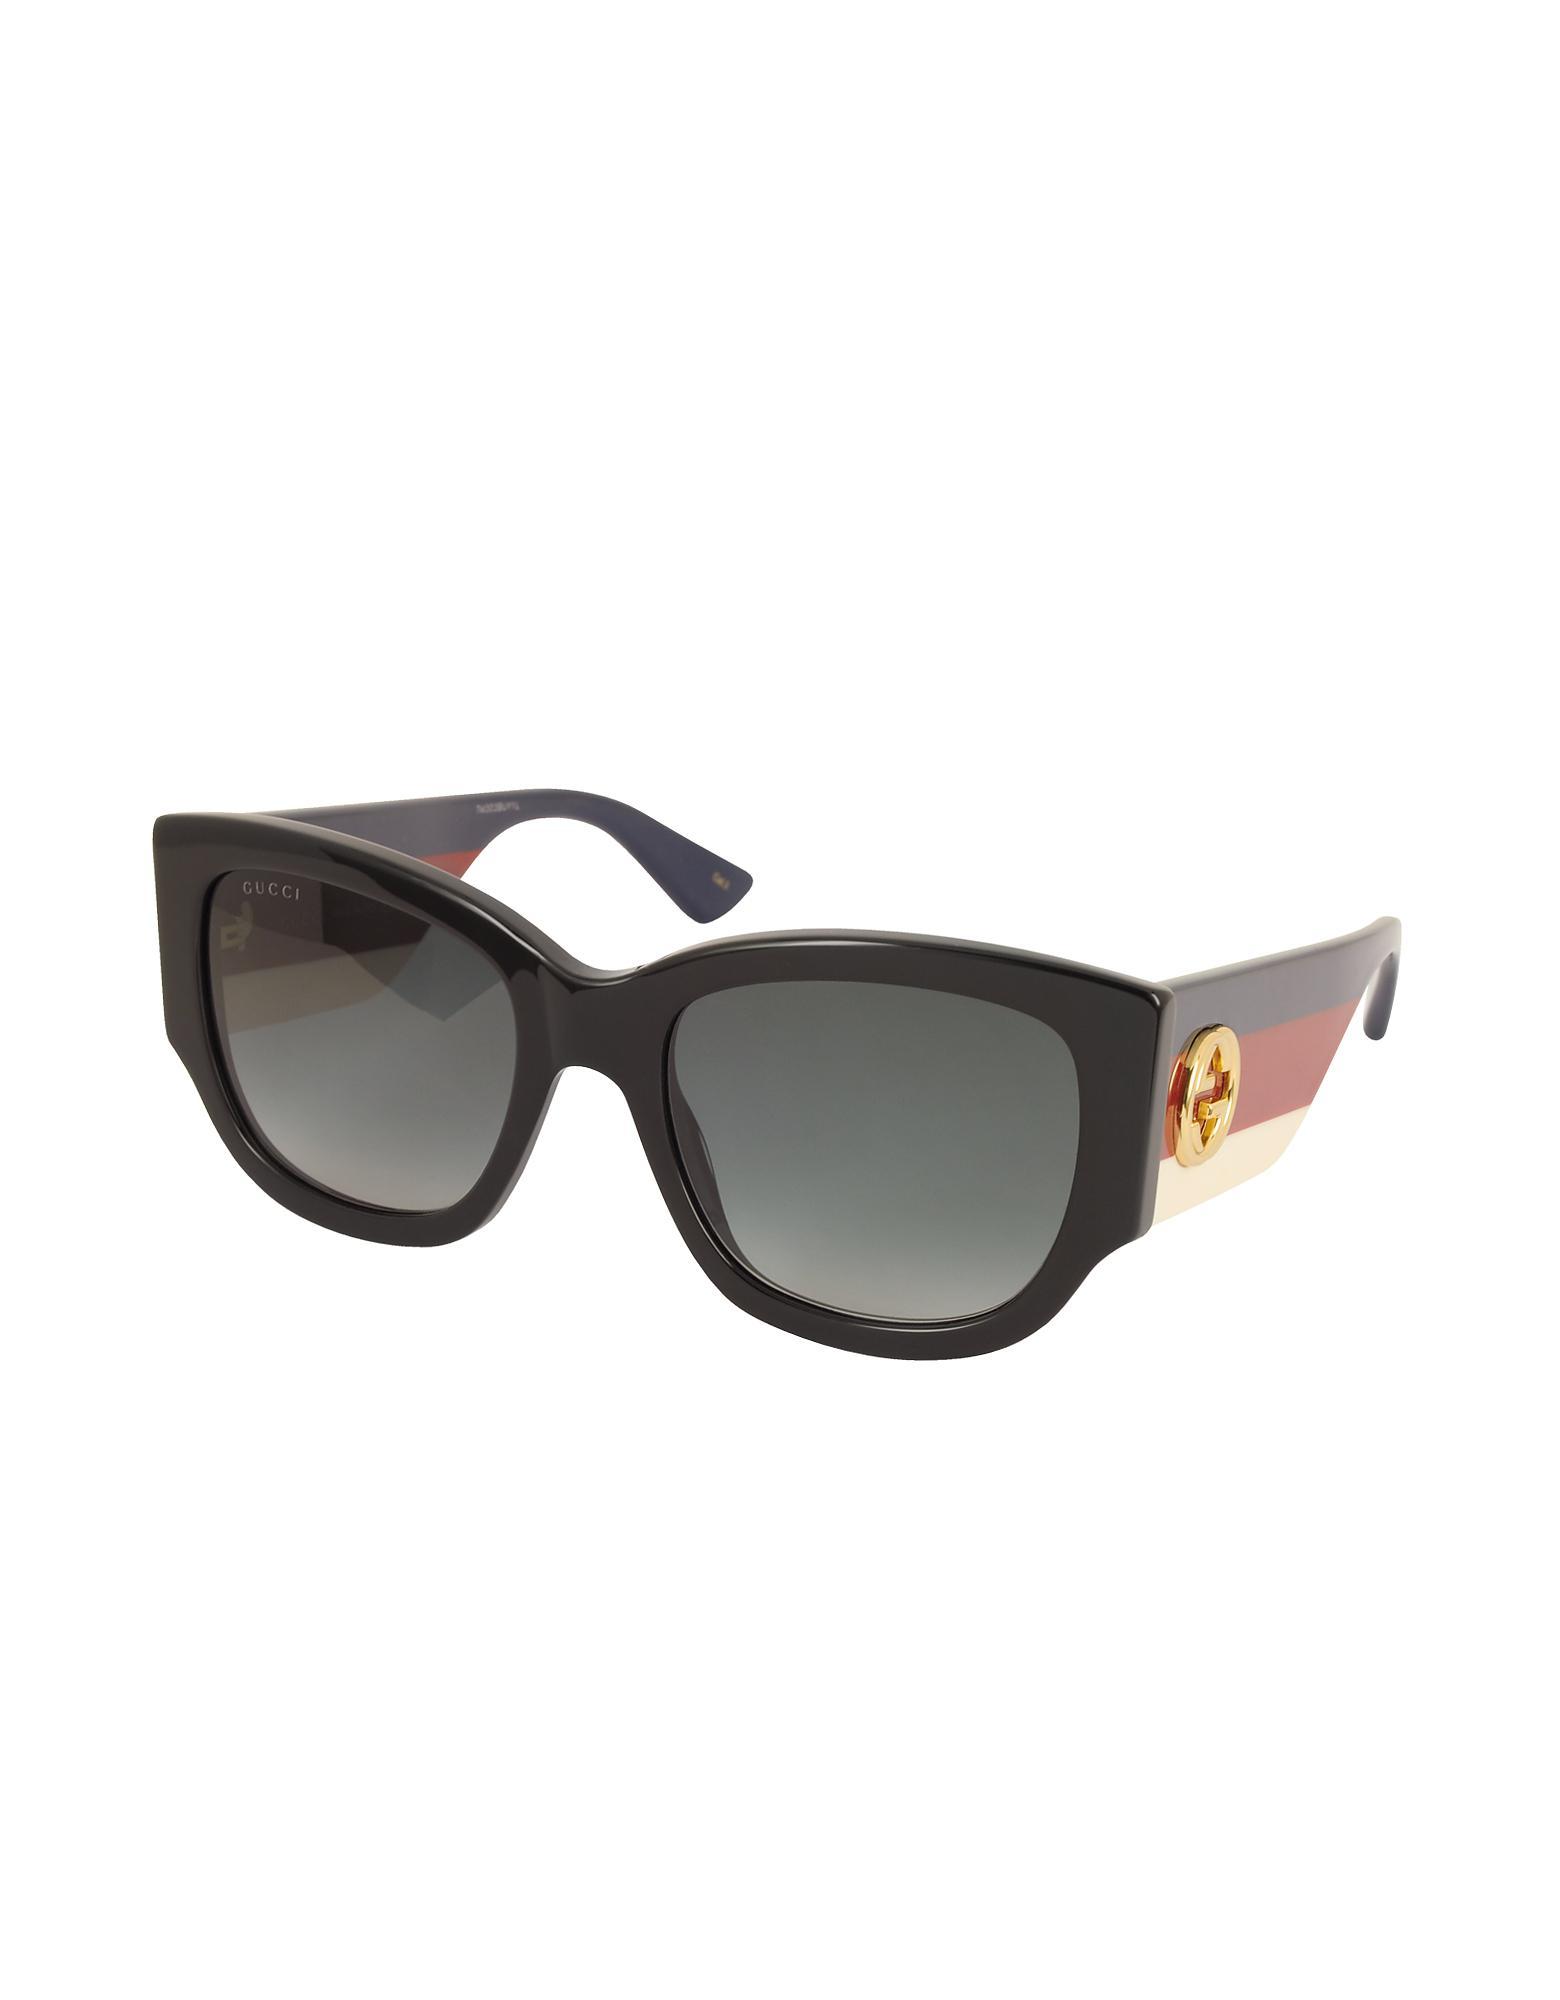 f1b52db91d4 Gucci GG0276S Black Oversize Cat Eye Acetate Sunglasses W sylvie Web  Temples in Black - Lyst